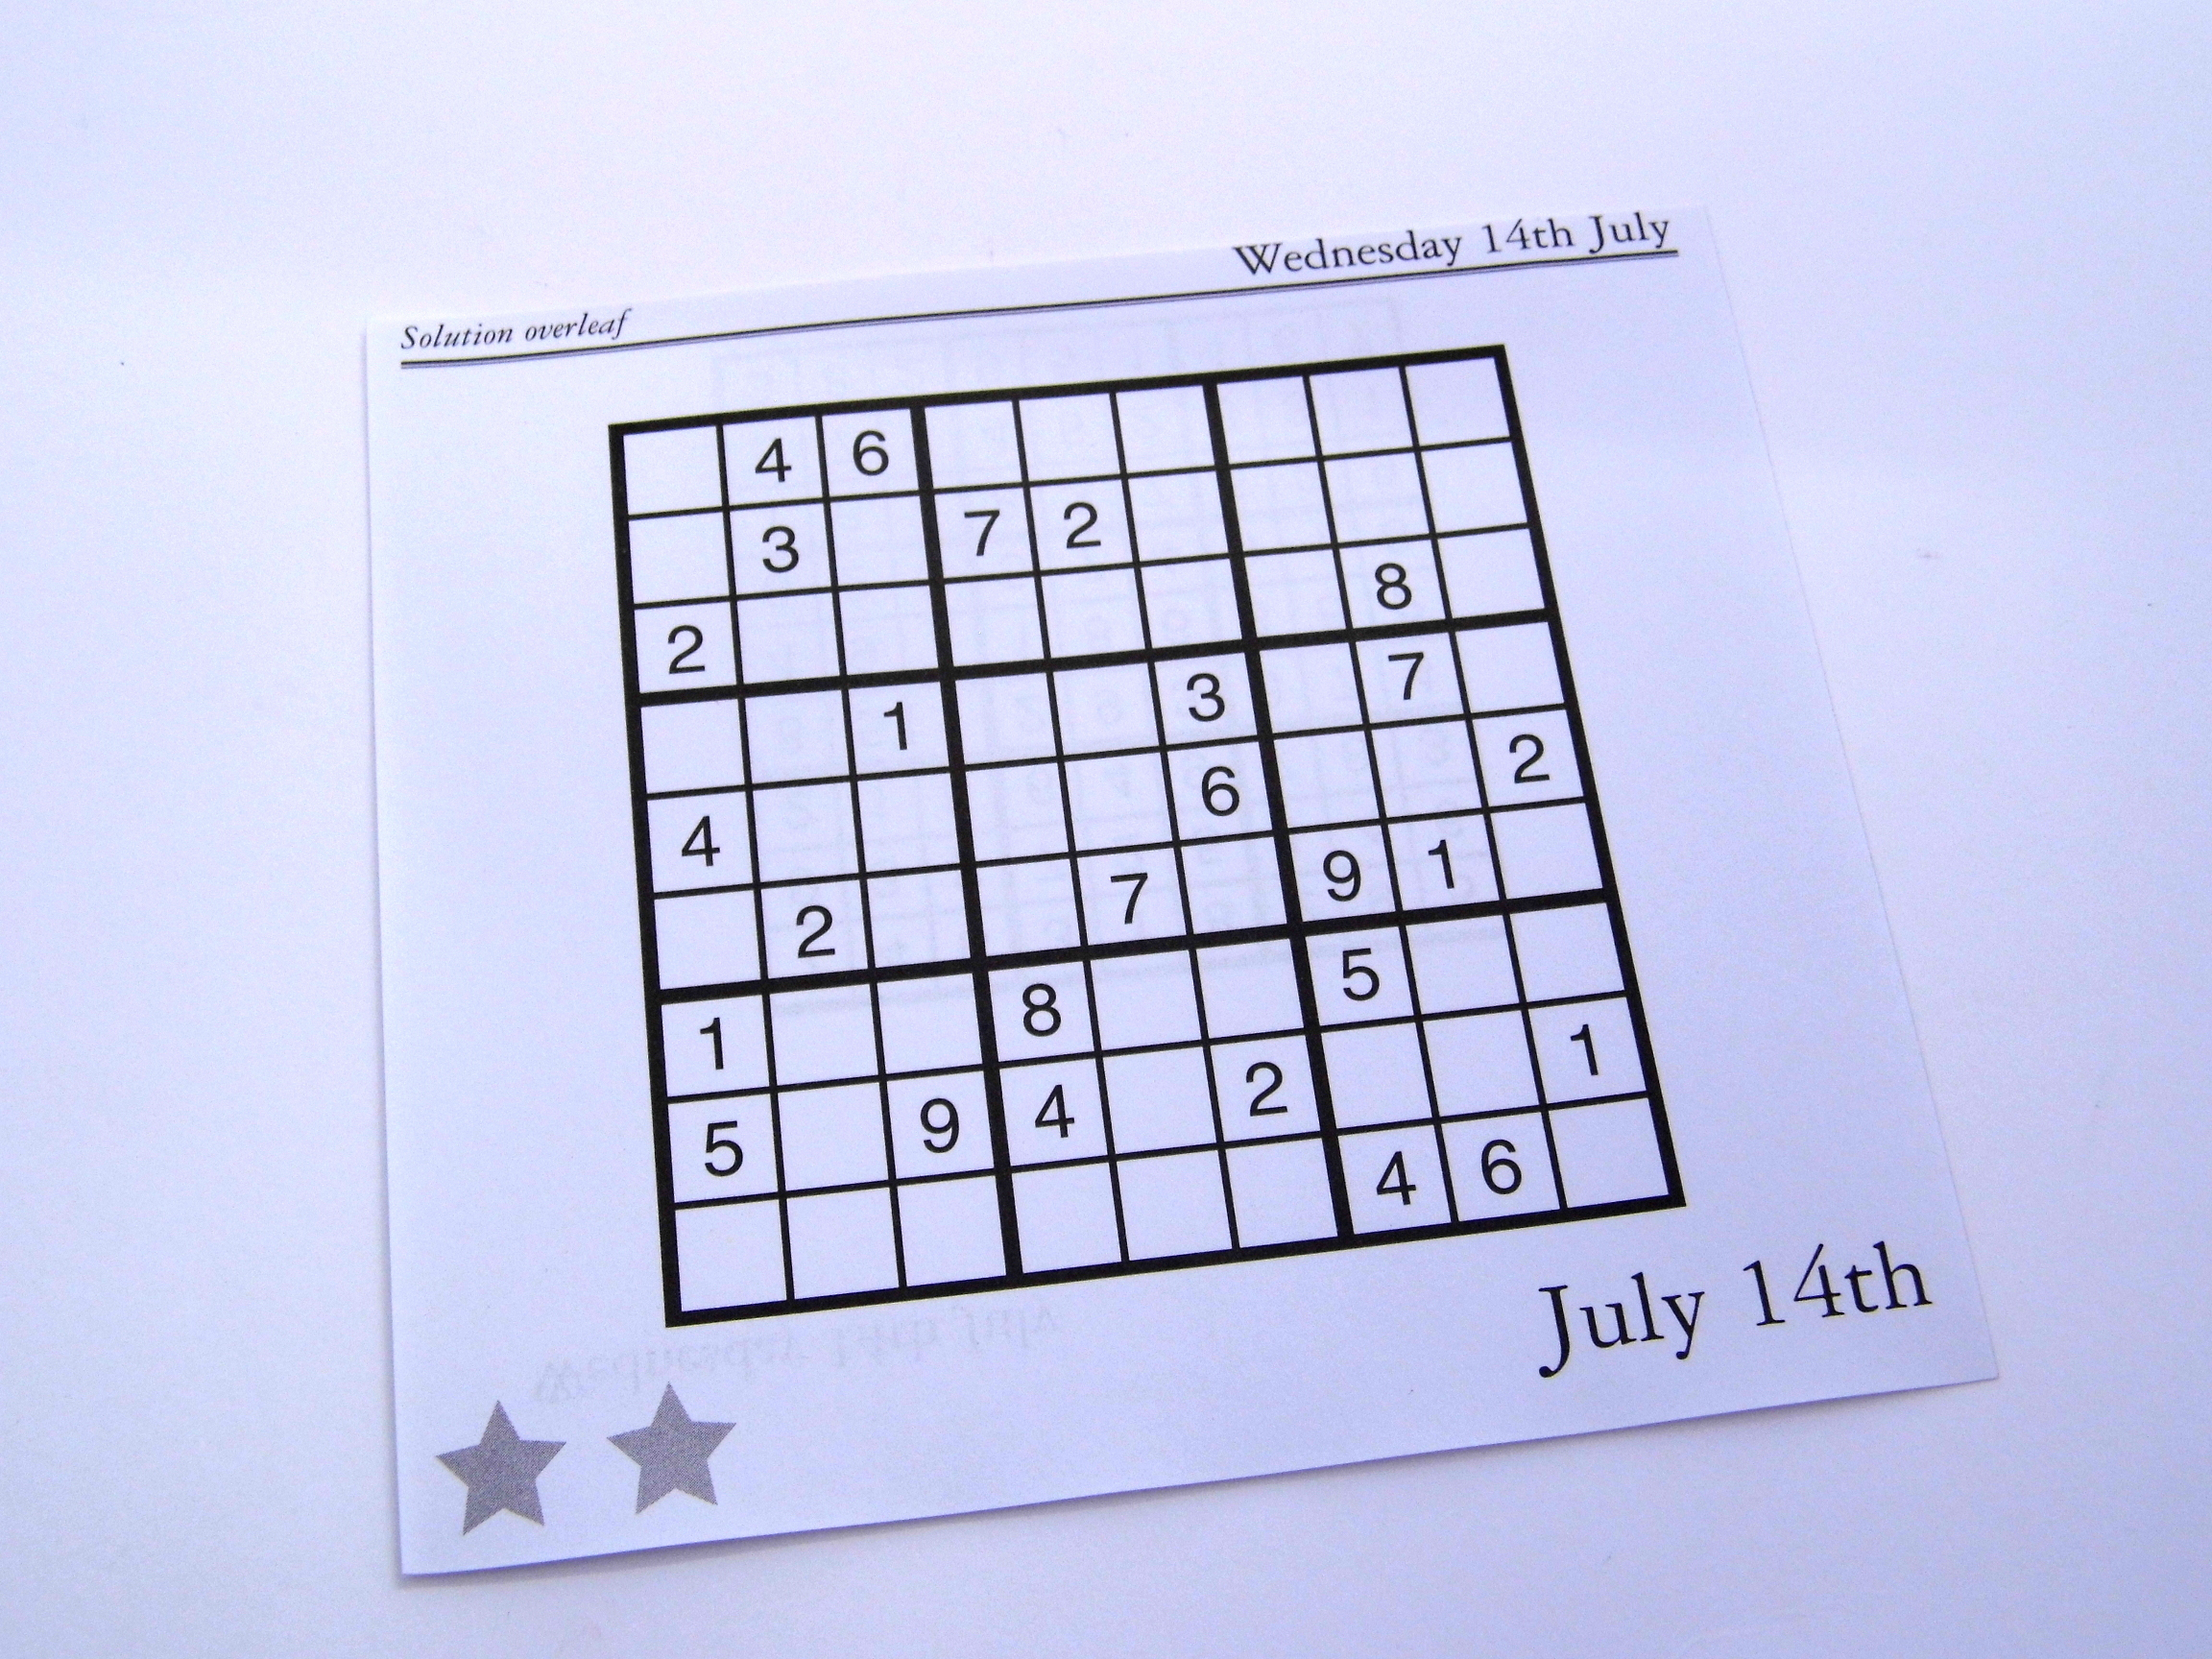 Archive Evil Puzzles – Free Sudoku Puzzles - Free Printable Sudoku 6 - Printable Sudoku Puzzles 1 Per Page